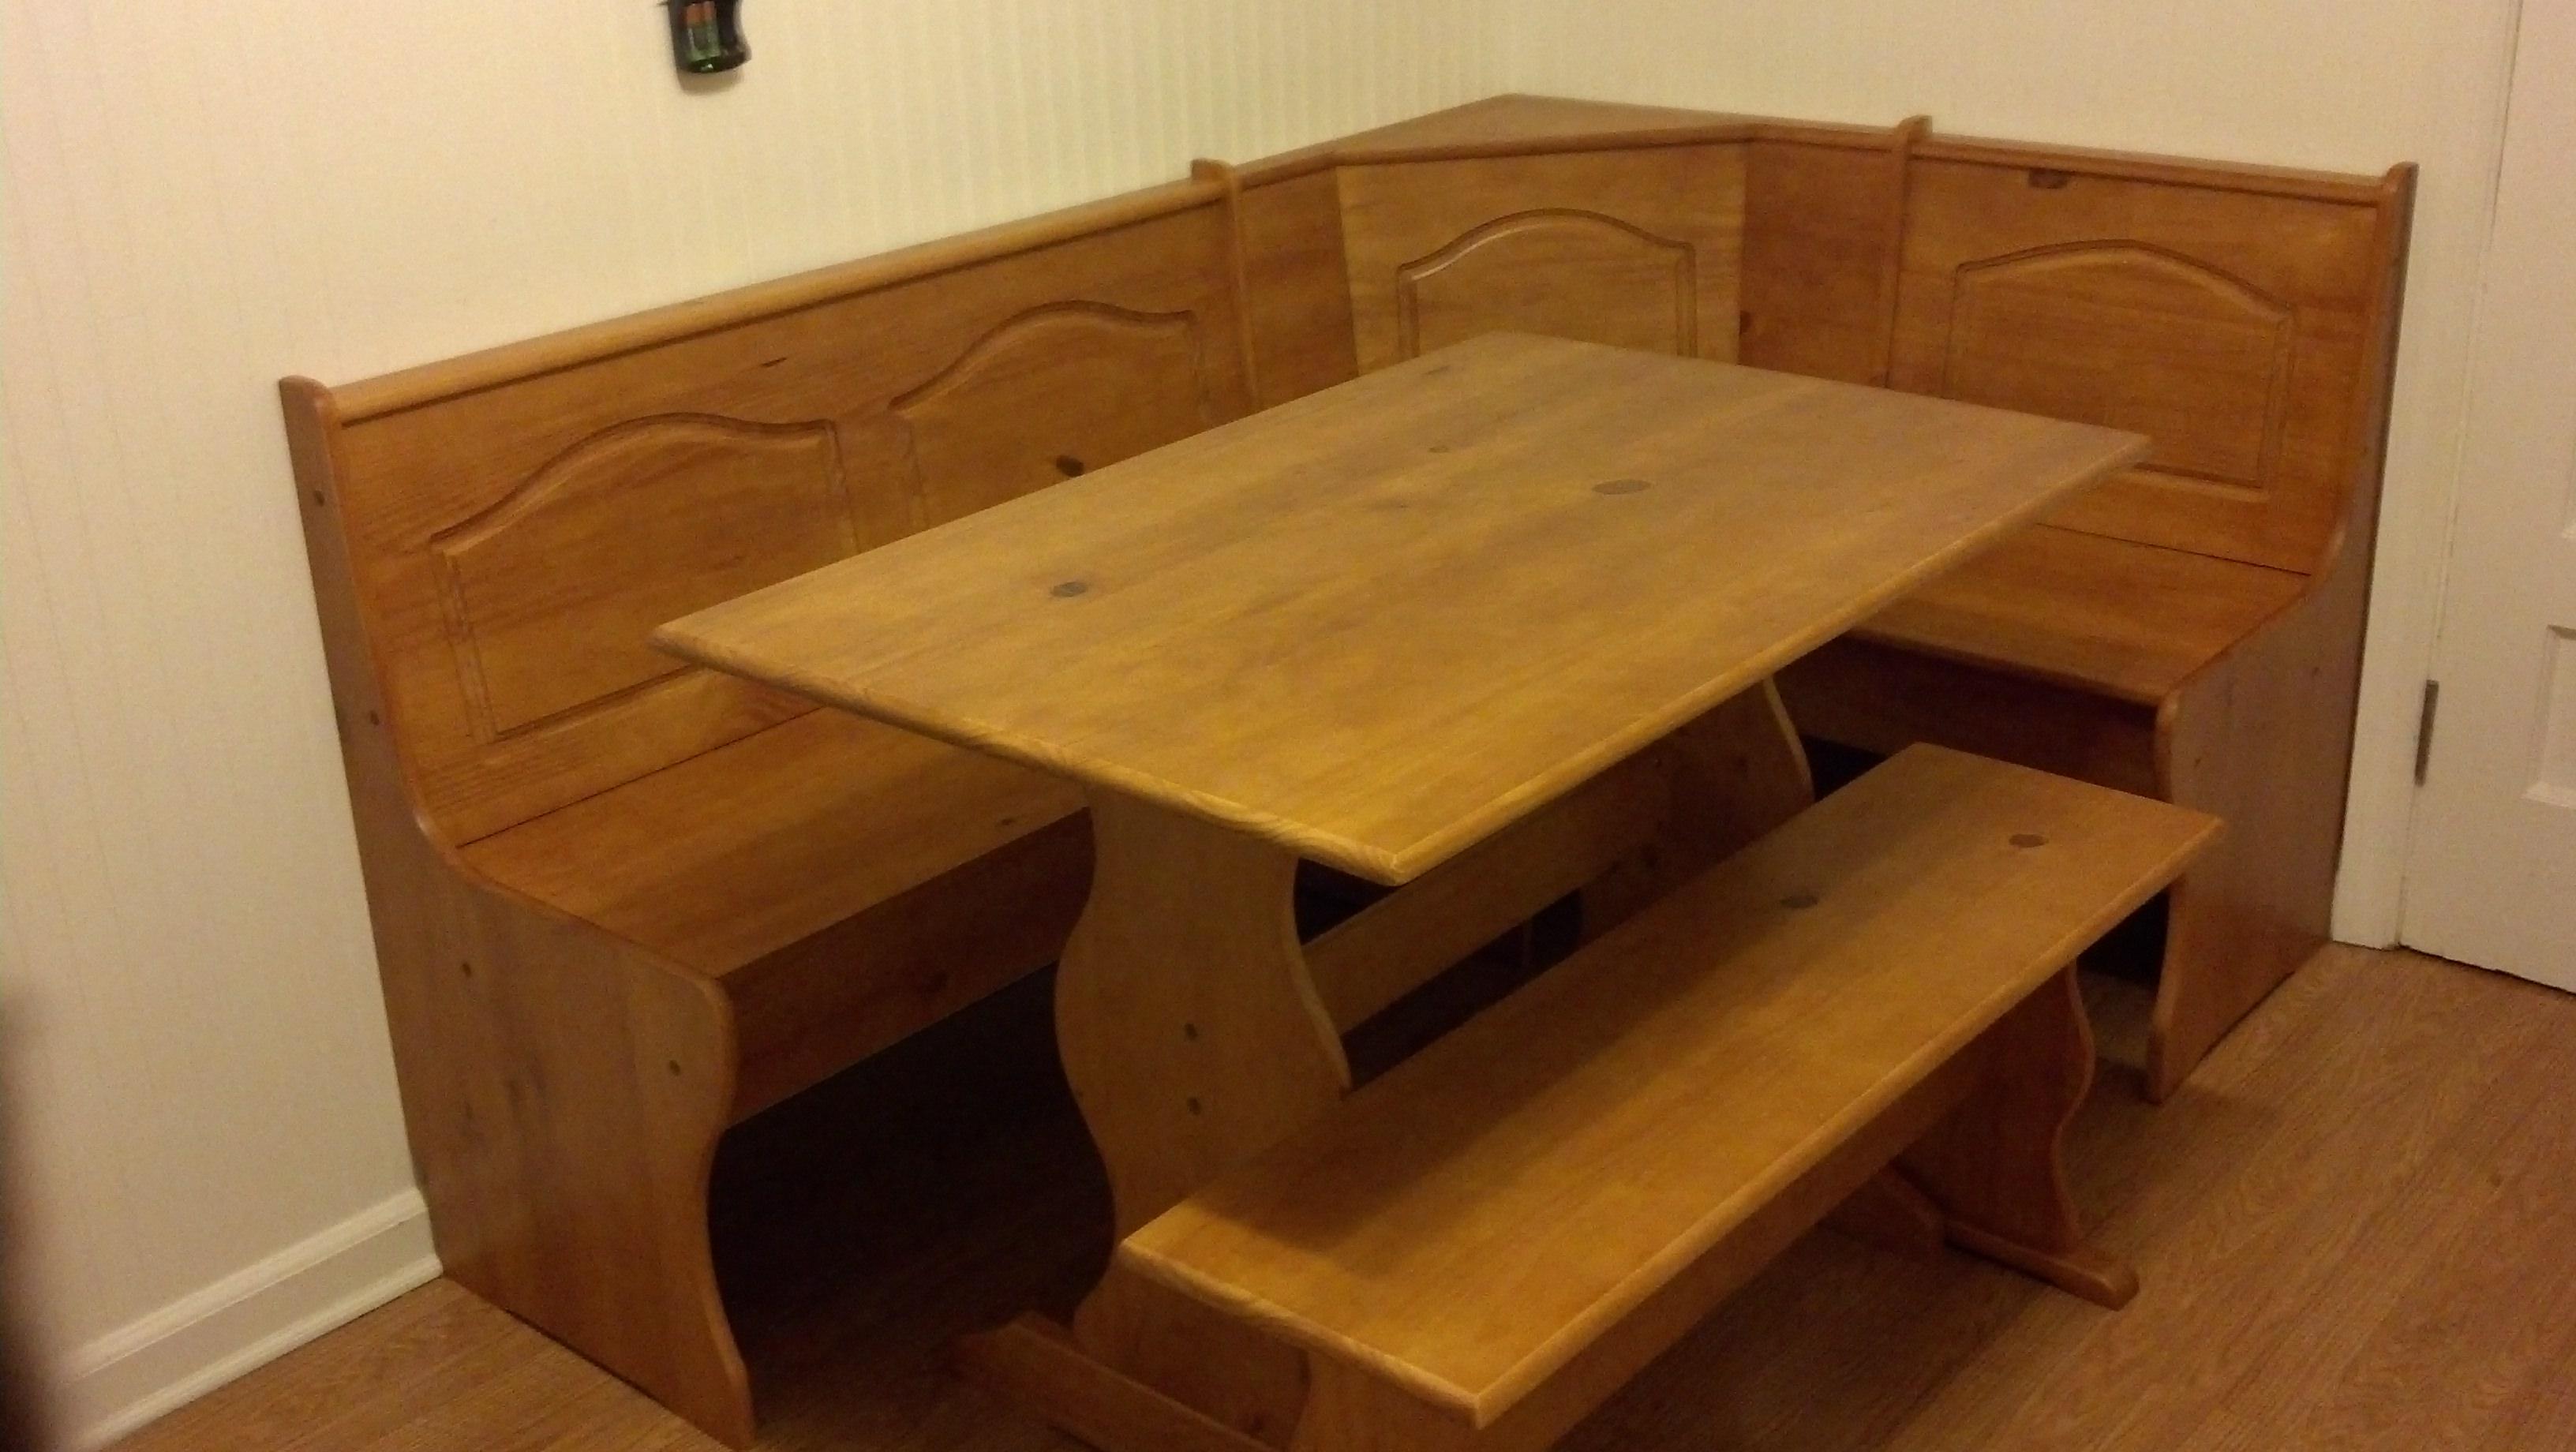 Shorten an Oversized Kitchen Bench Unit